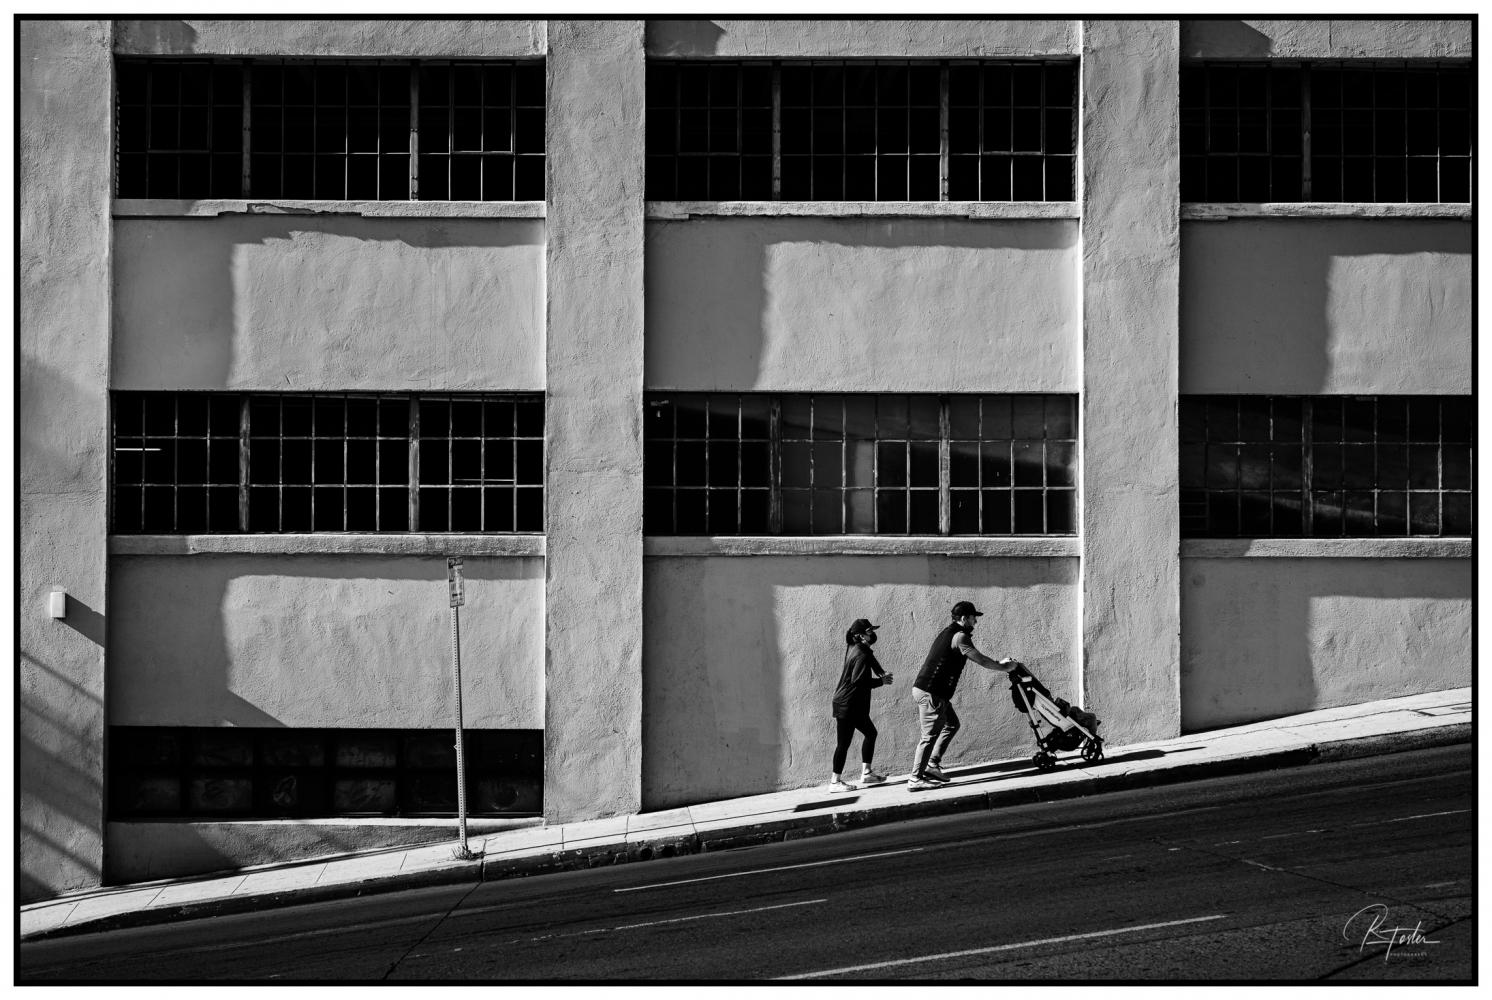 Parental Inclination, ©2021 Reginald Foster